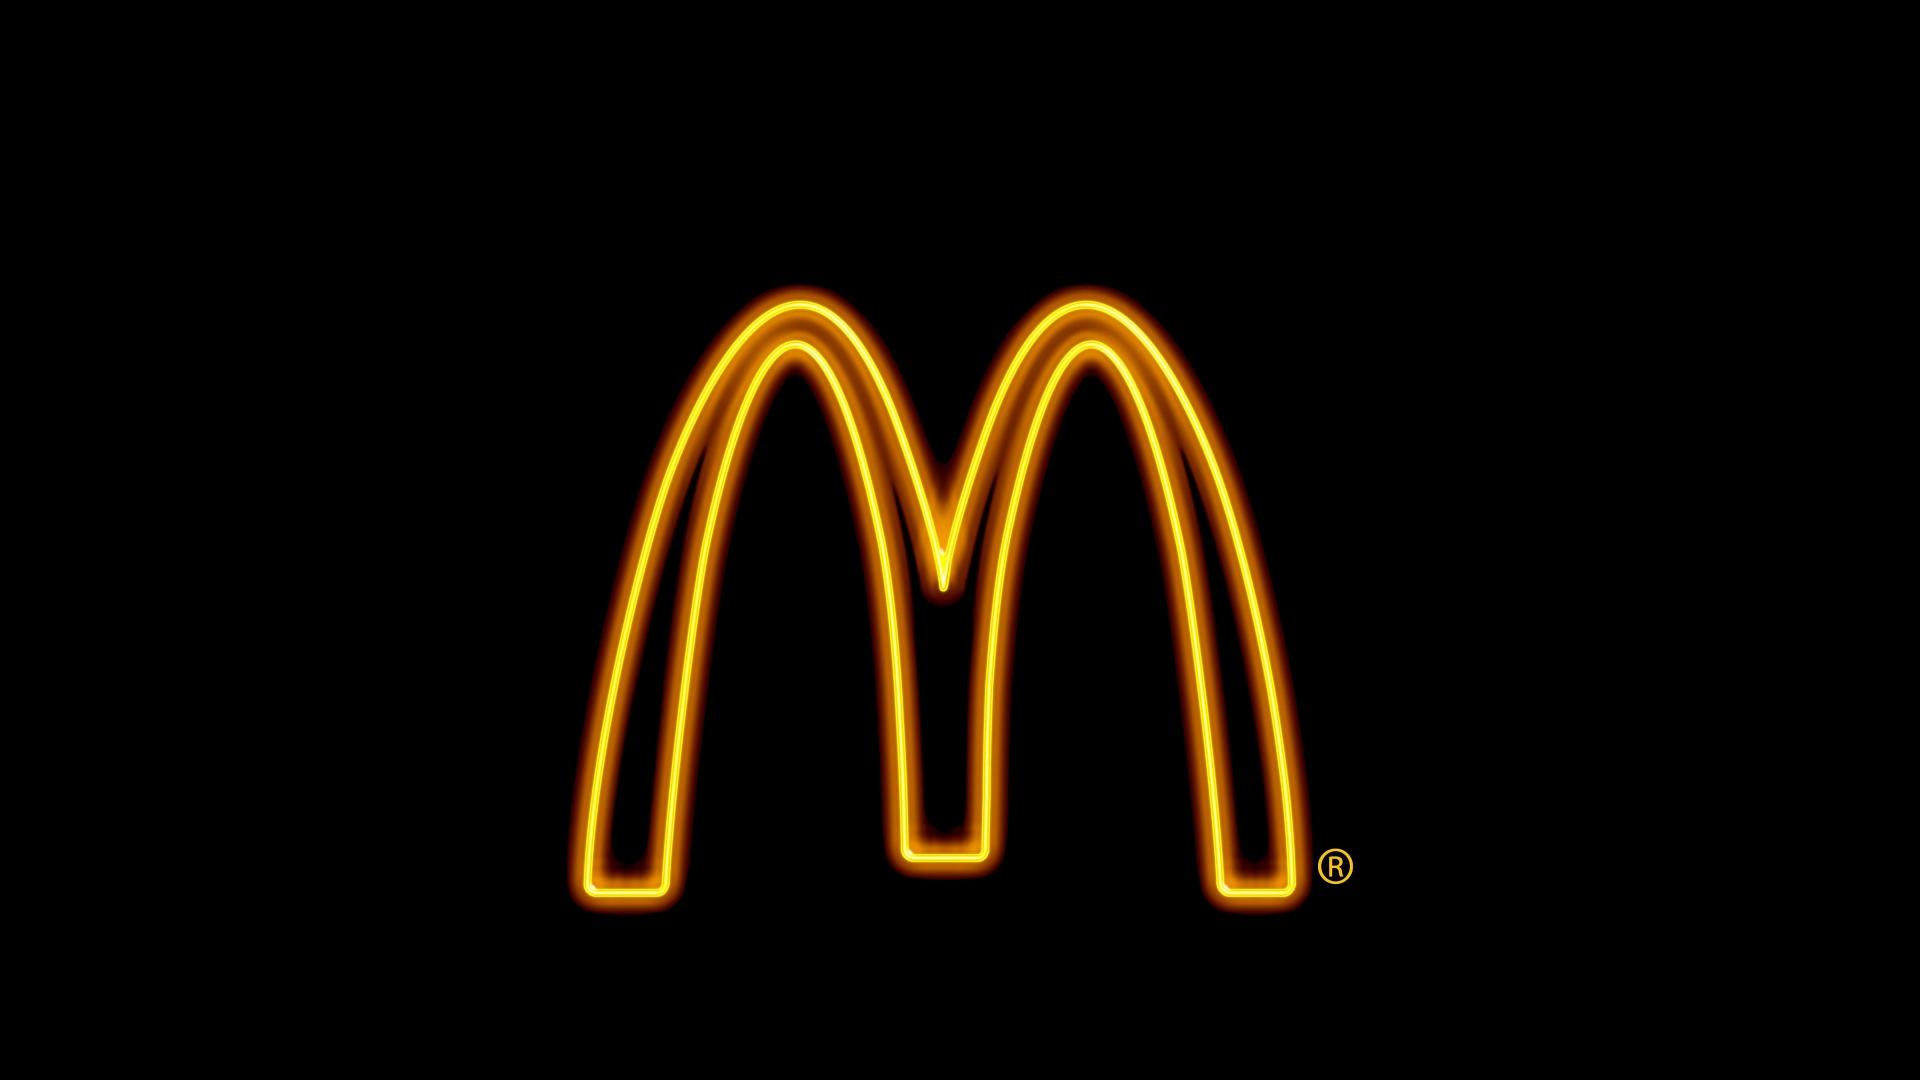 Metallica Wallpaper Hd 1080p McDonalds Wallpapers H...